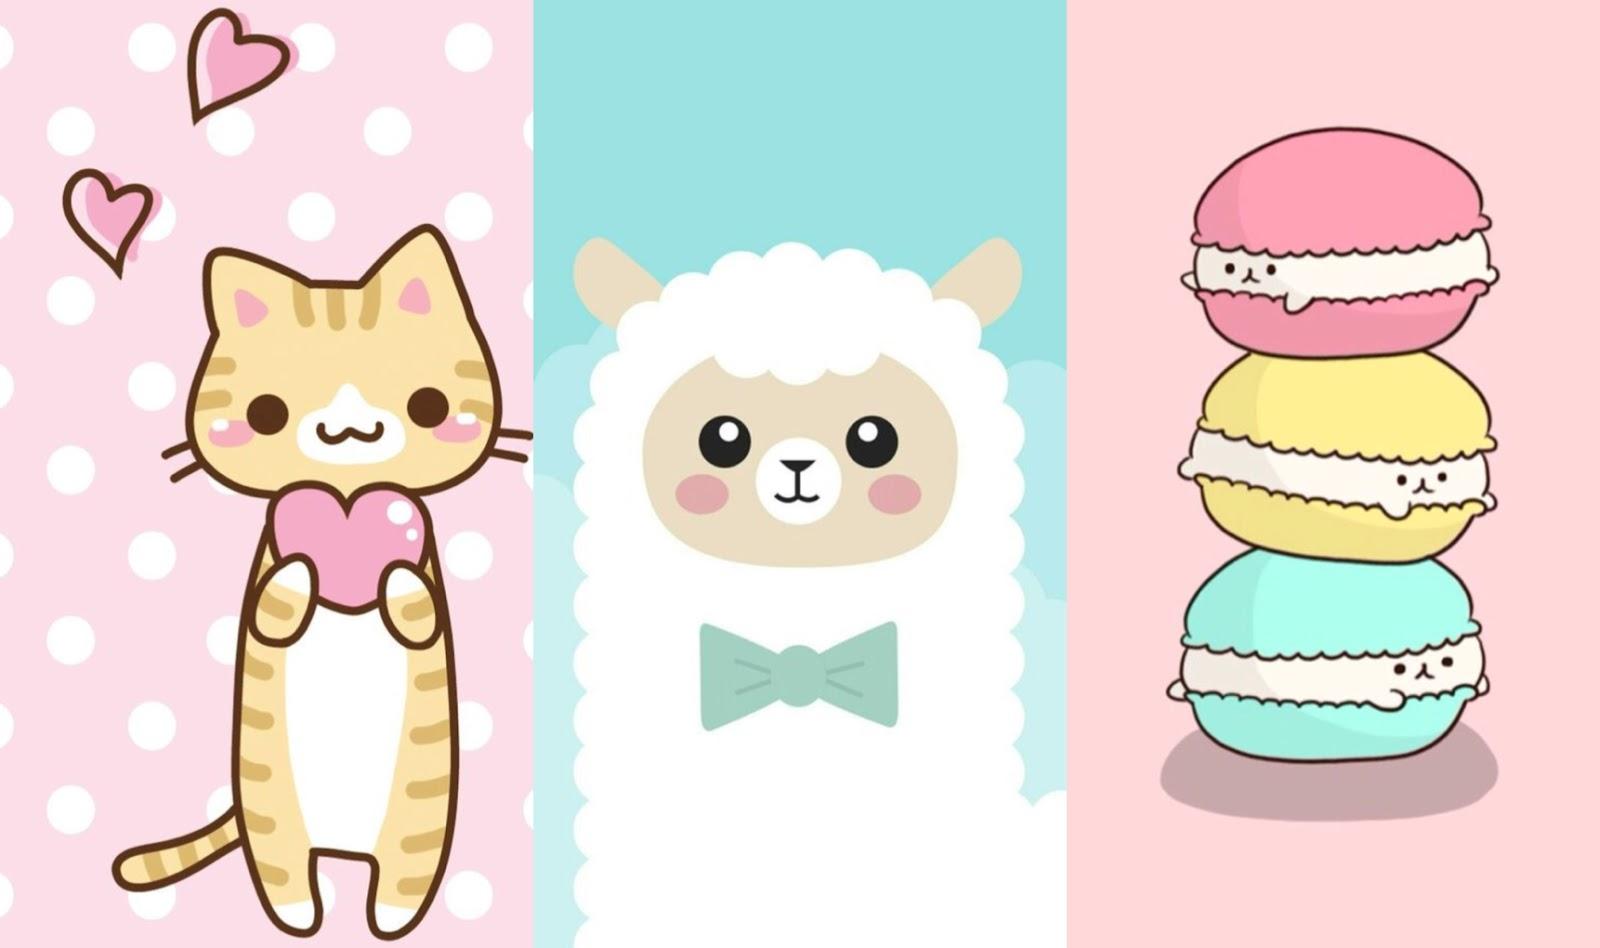 Cute Kawaii Wallpapers Page 1